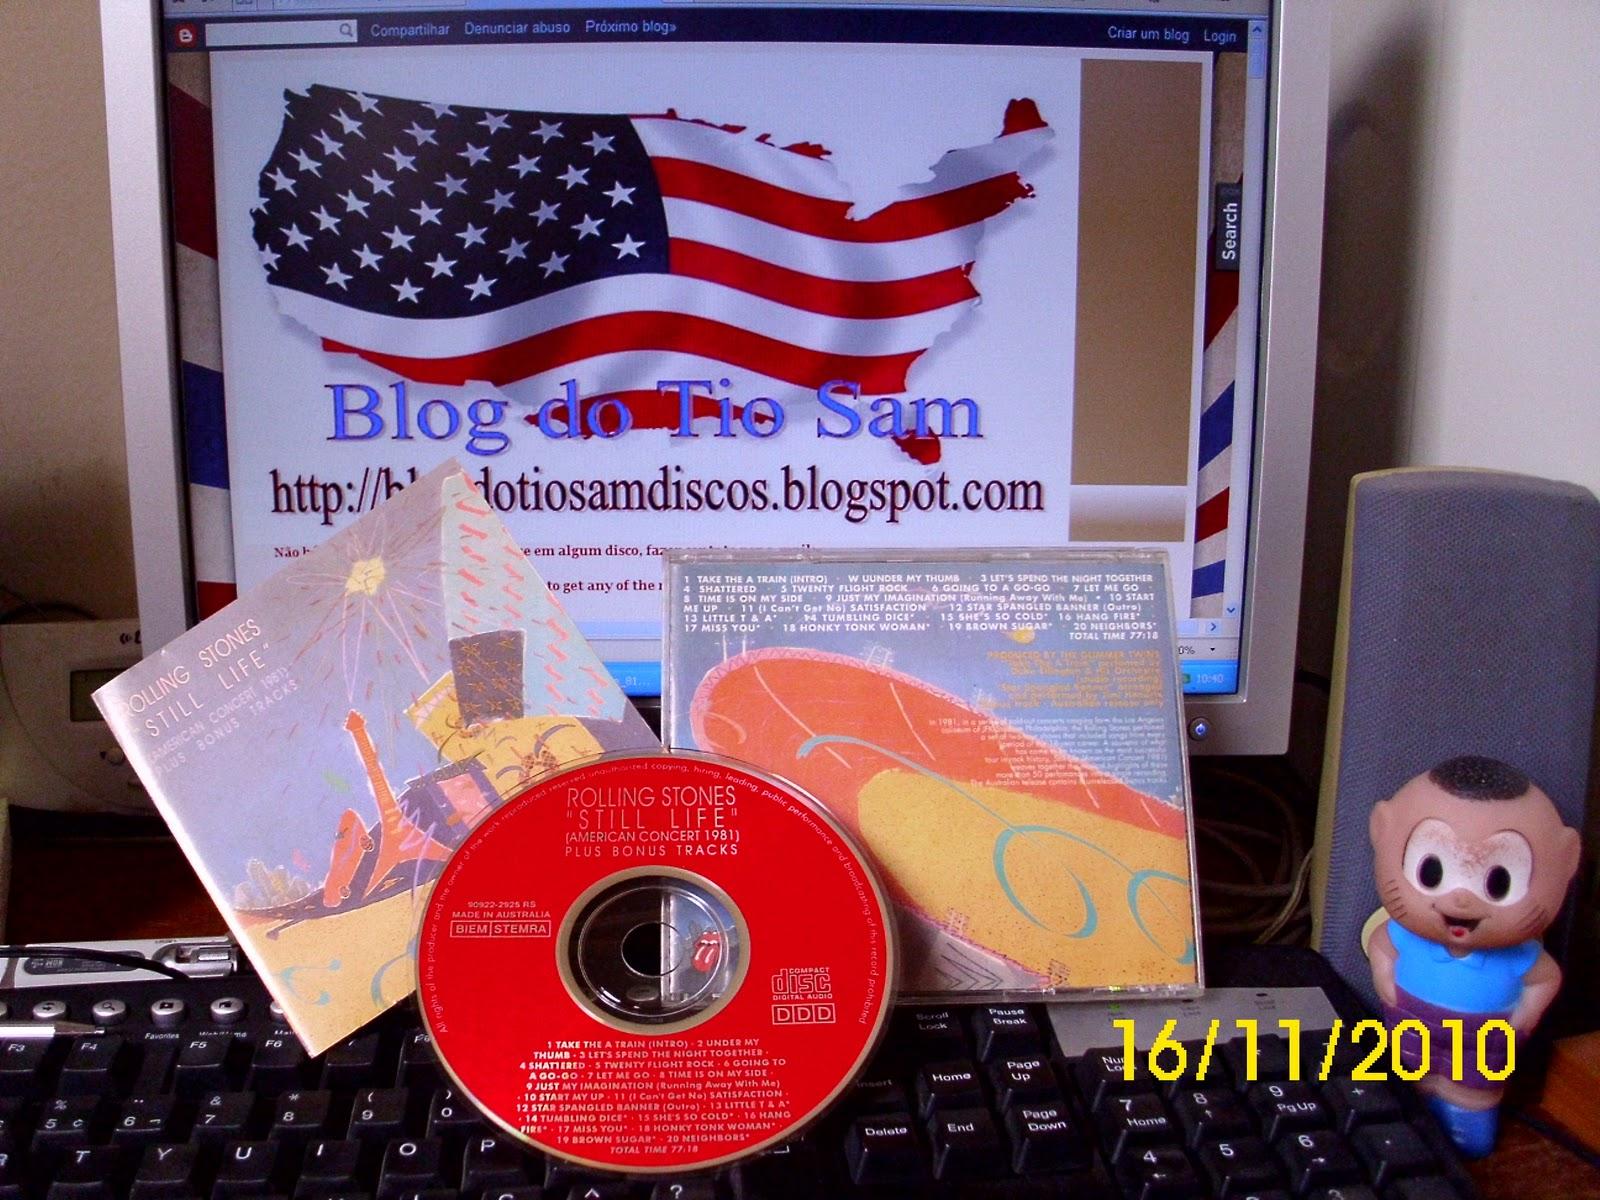 http://2.bp.blogspot.com/_3nUmmXrIfb0/TOKfJlVuW_I/AAAAAAAAACo/YhyVO9fz4ys/s1600/CAPA+01.JPG